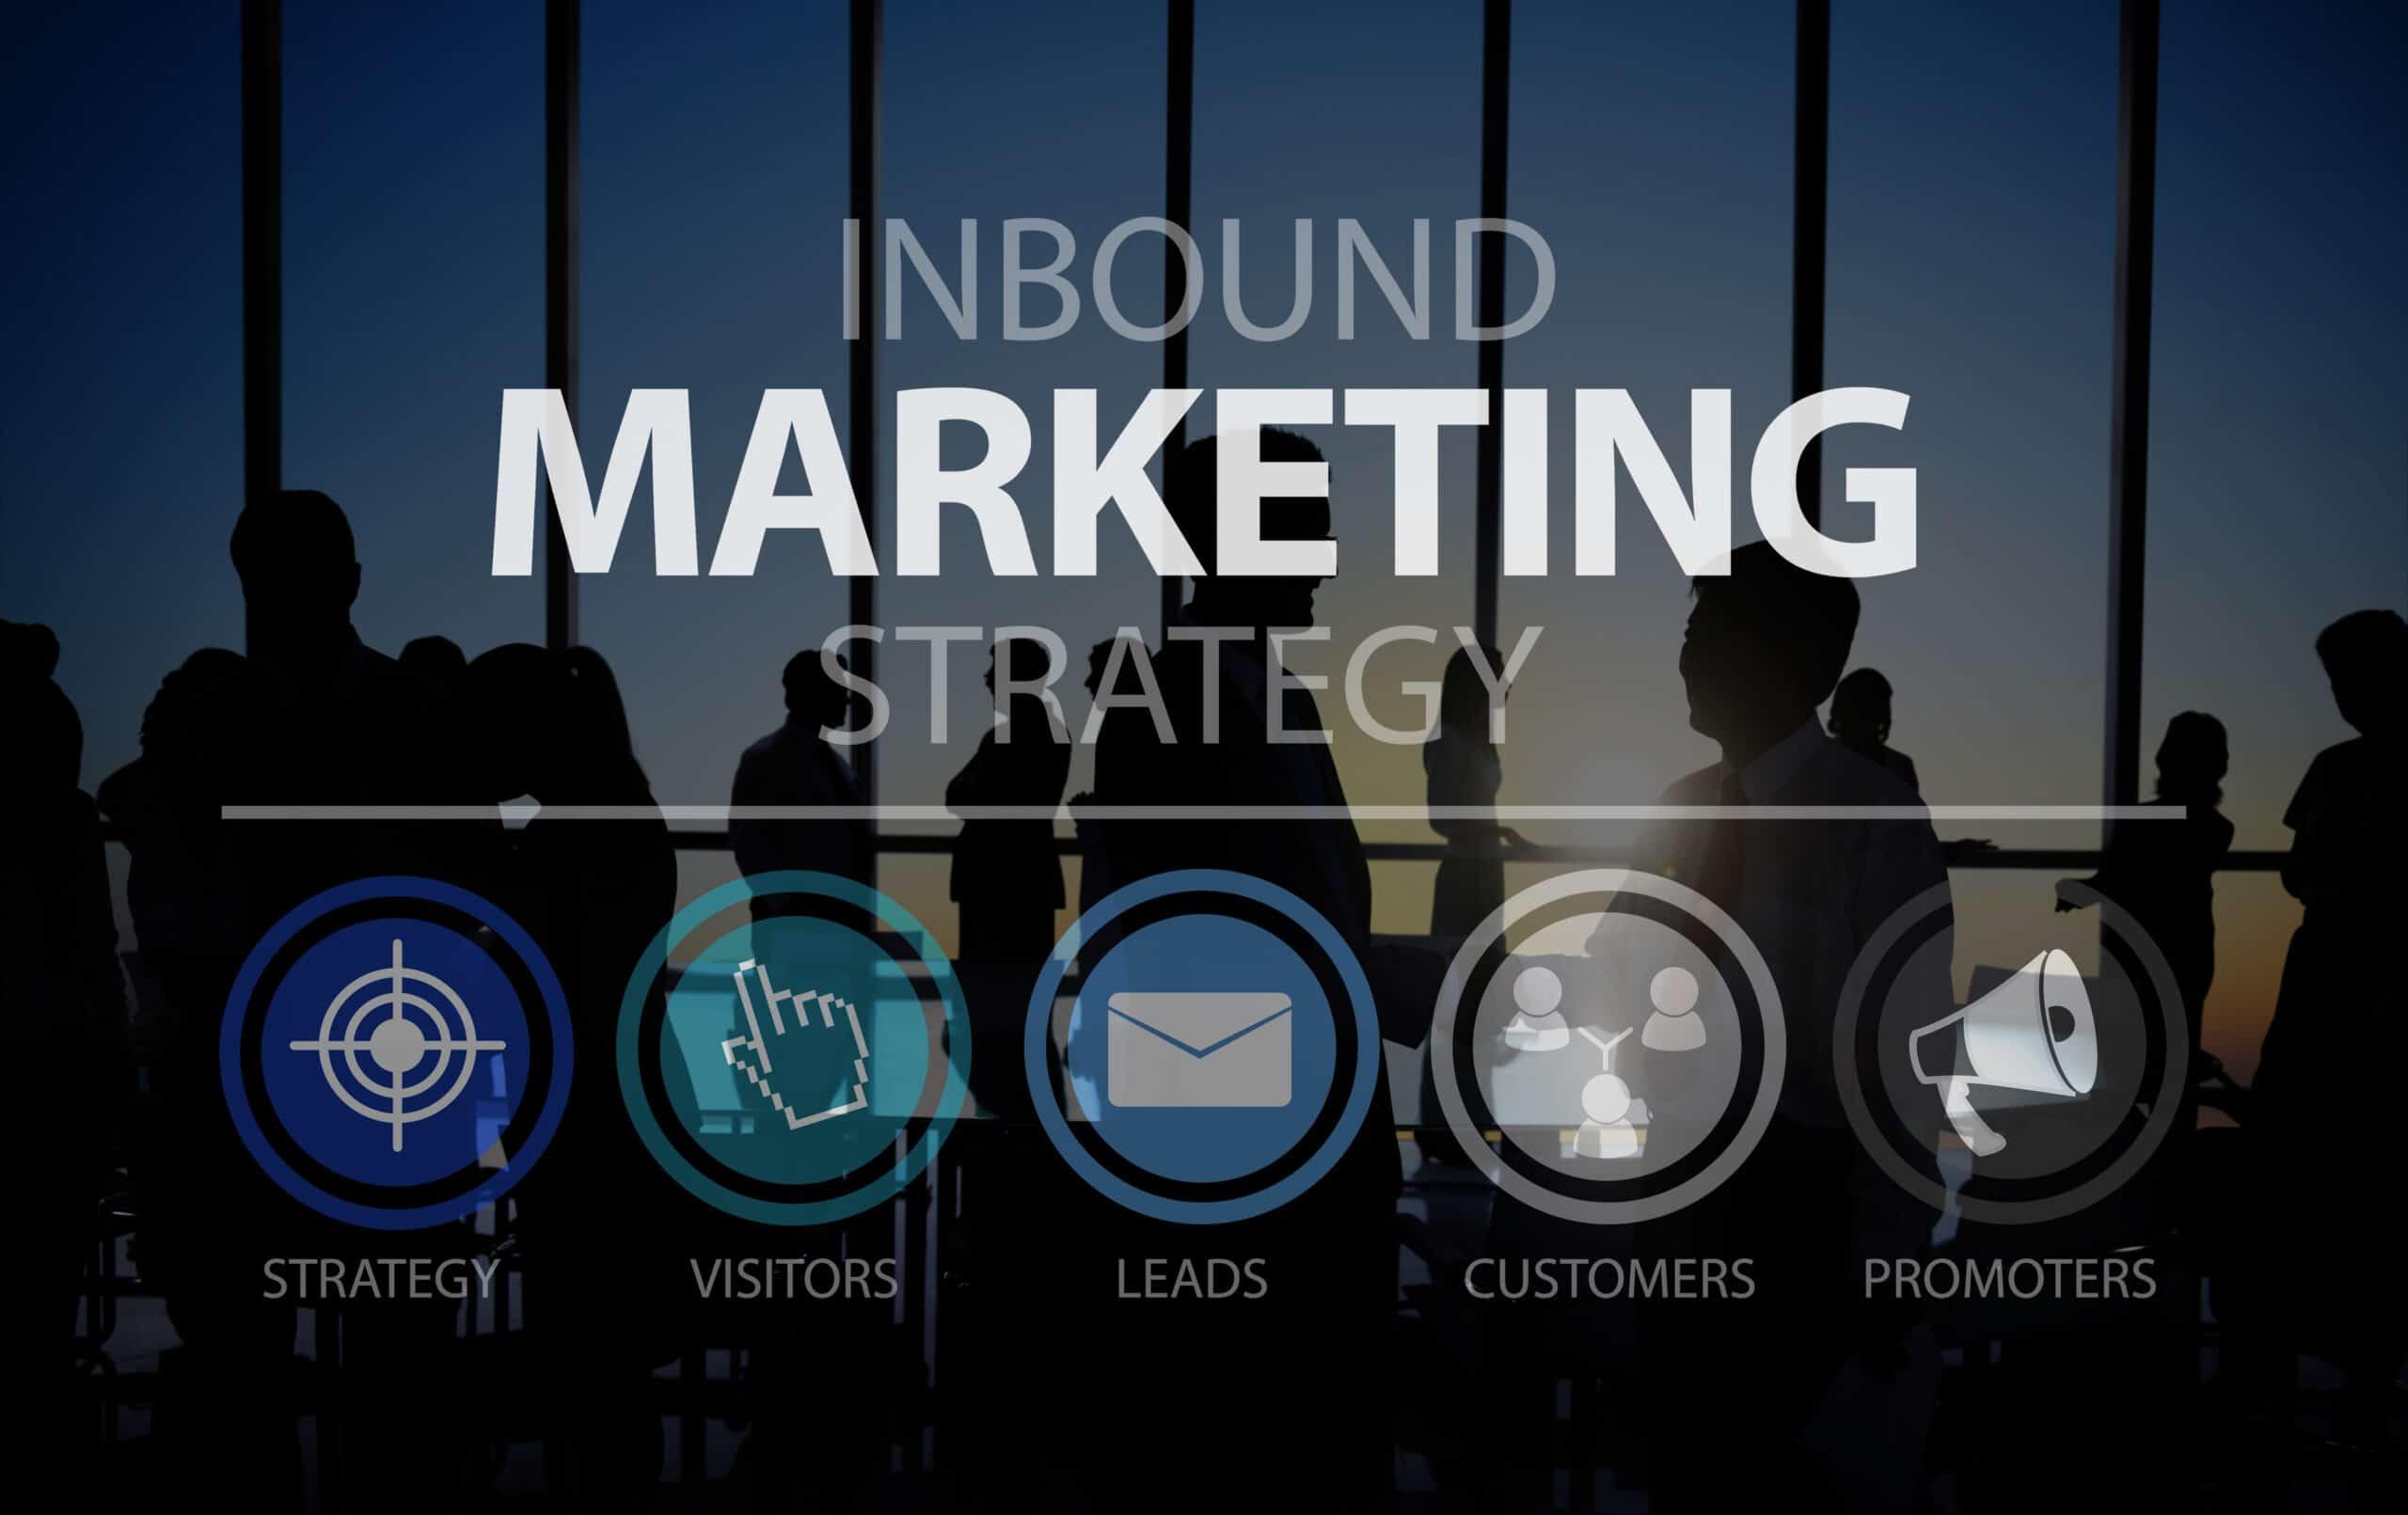 inbound marketingn marketing strategy commerce online concept 1 scaled